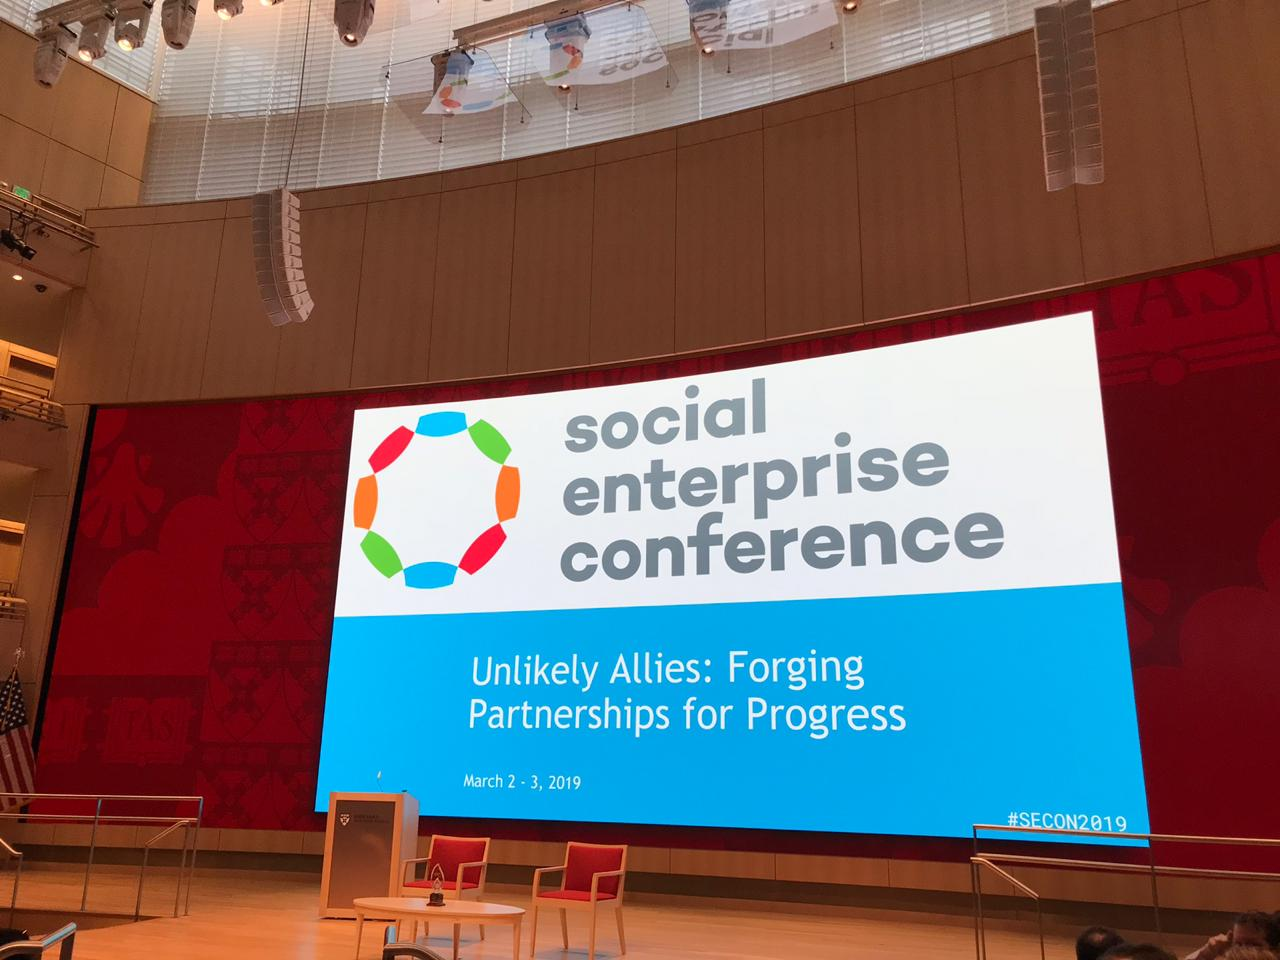 Social Enterprise Conference 2019